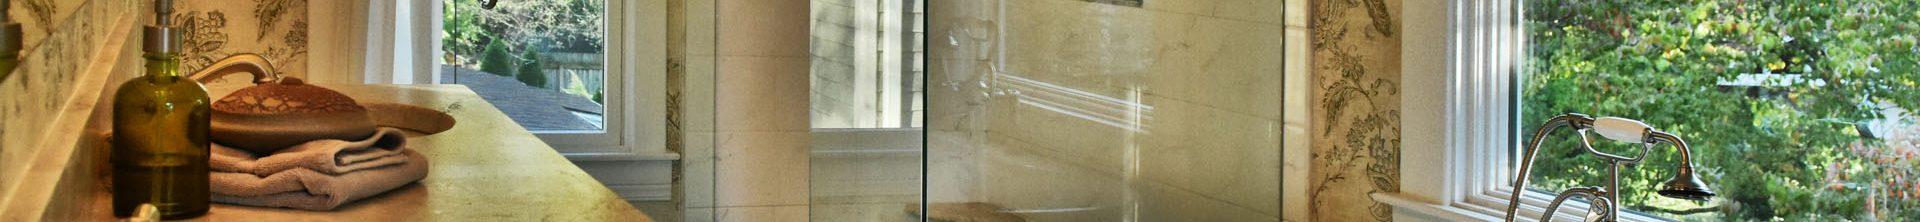 Louisville Interior Designer, Louisville Renovation Designer, Interior Design, Renovation Design, Master Bath Renovation, White Vanity, Marble Vanity Top, Stainless Fixtures, Bathroom Mirror, Vanity Lighting, Marble Floor Tile, Wallpaper, Beautiful Master Bath Renovation, Freestanding Soaking Tub, Custom Shower Tile, Glass Shower Enclosure